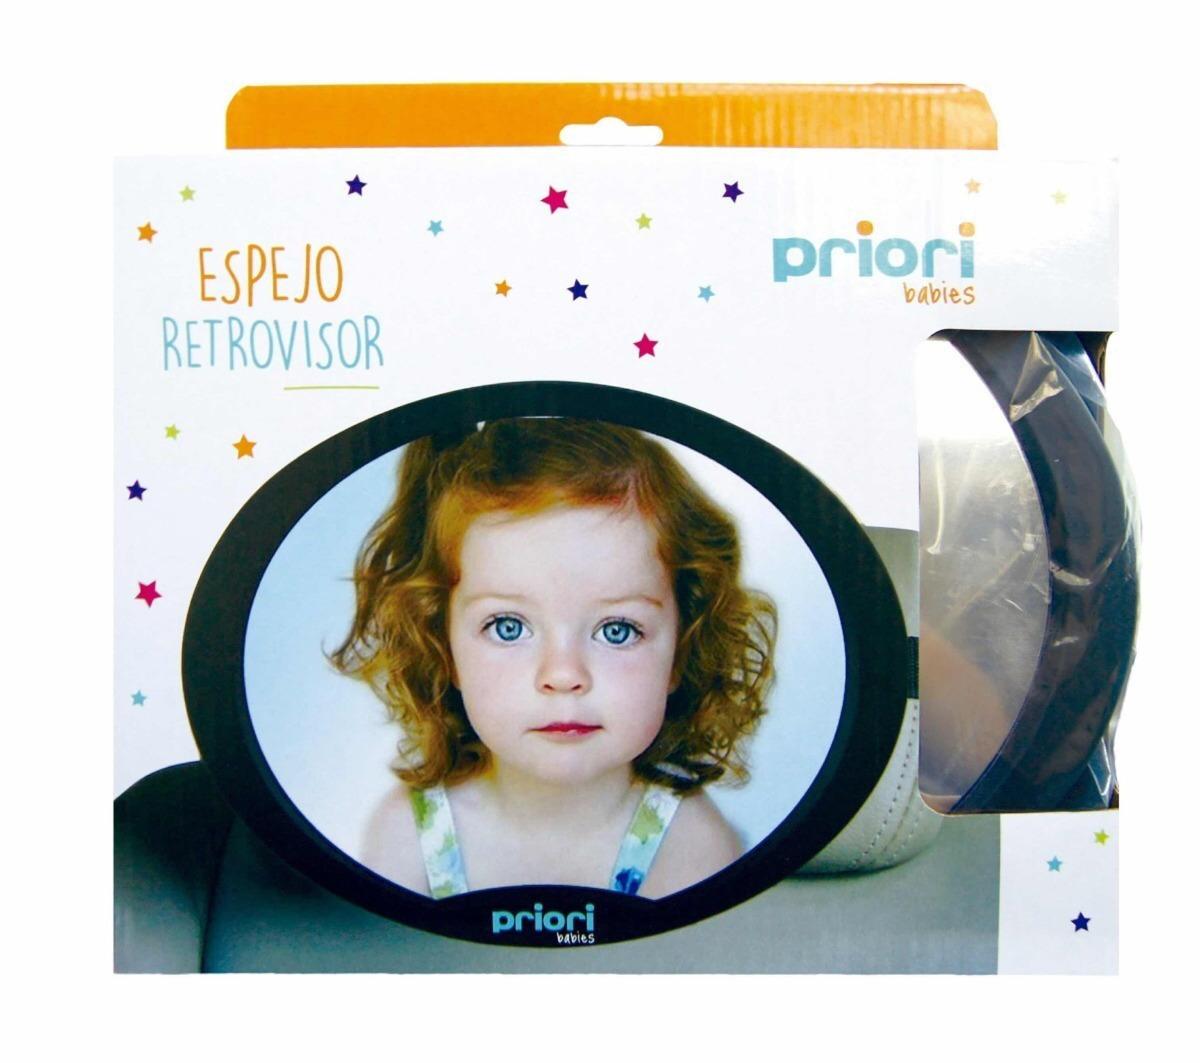 Espejo Retrovisor Bebe Priori 550 00 En Mercado Libre